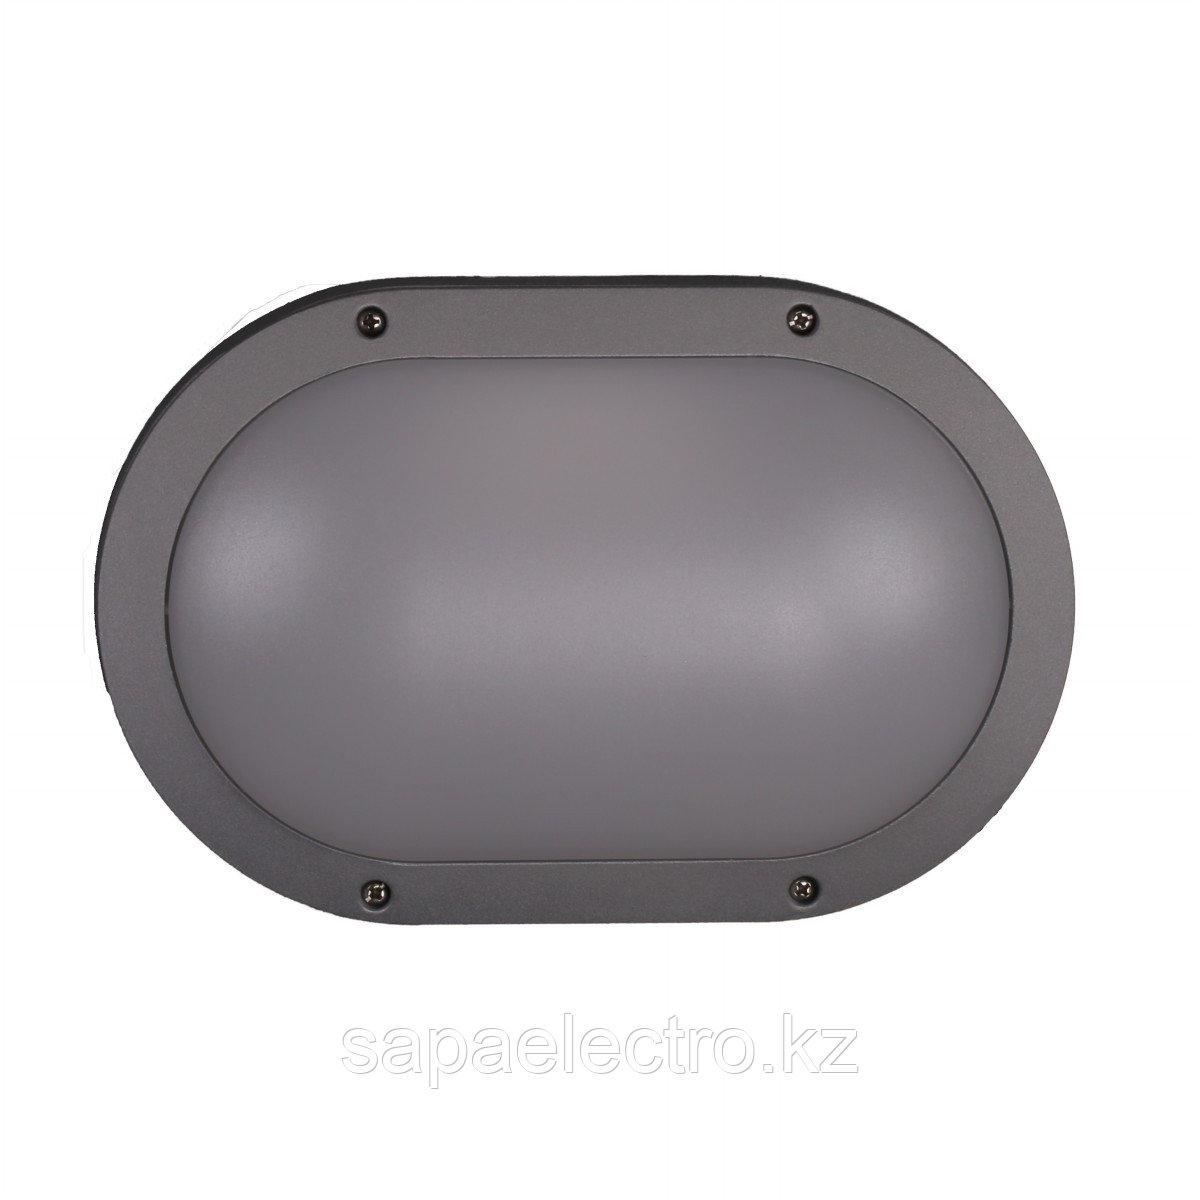 Svet-k FD016-4 20W Silver Grey 6000K IP65 (TEKL)18